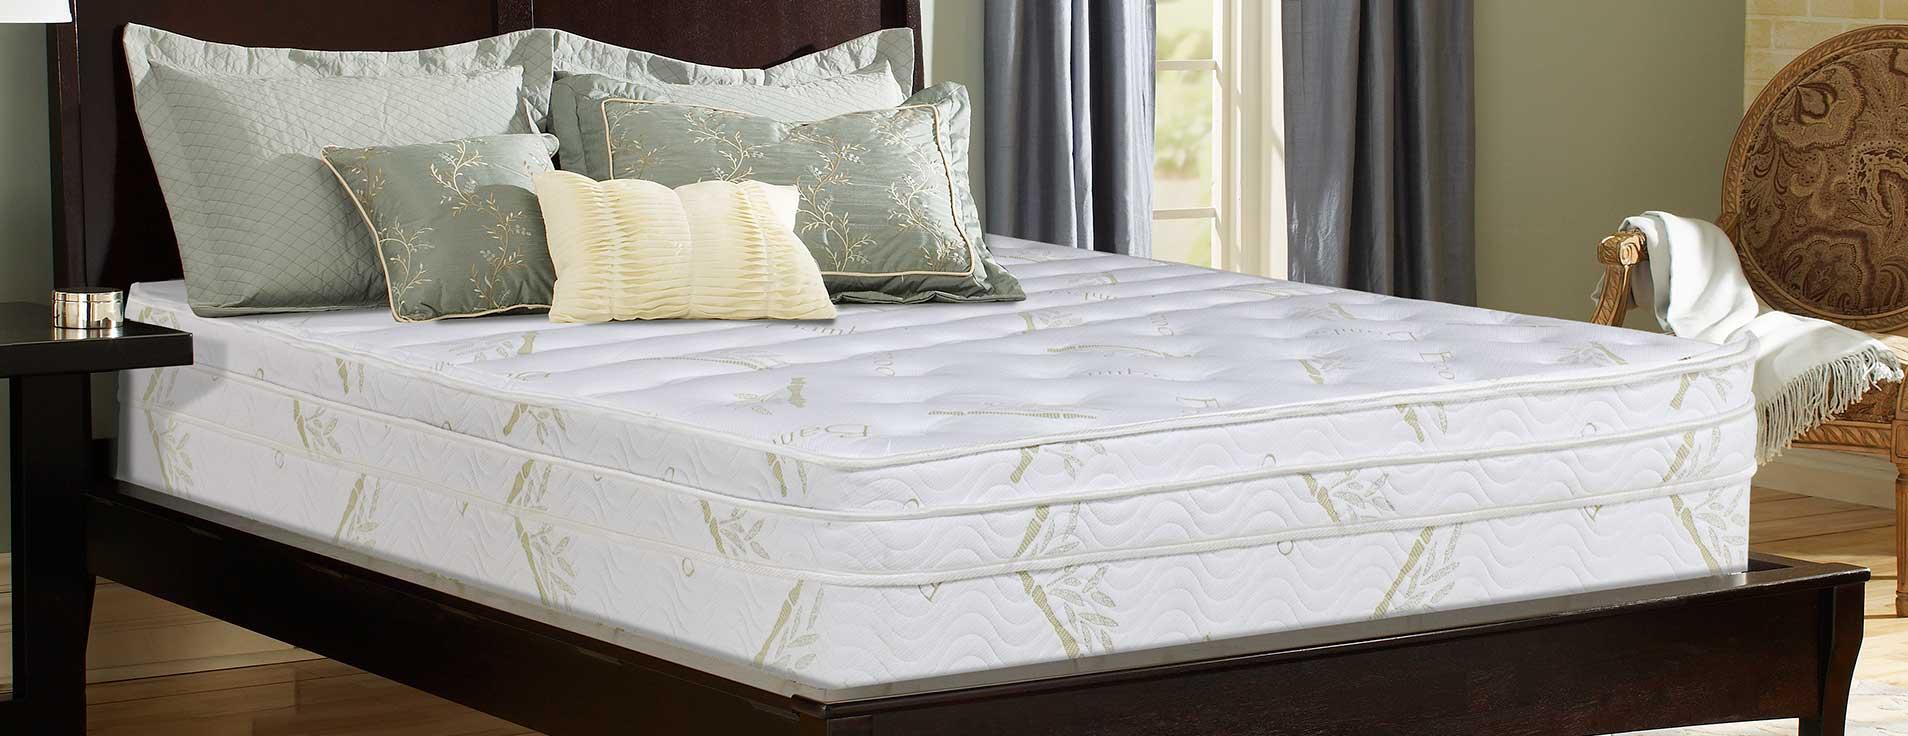 Boyd waterbed mattress